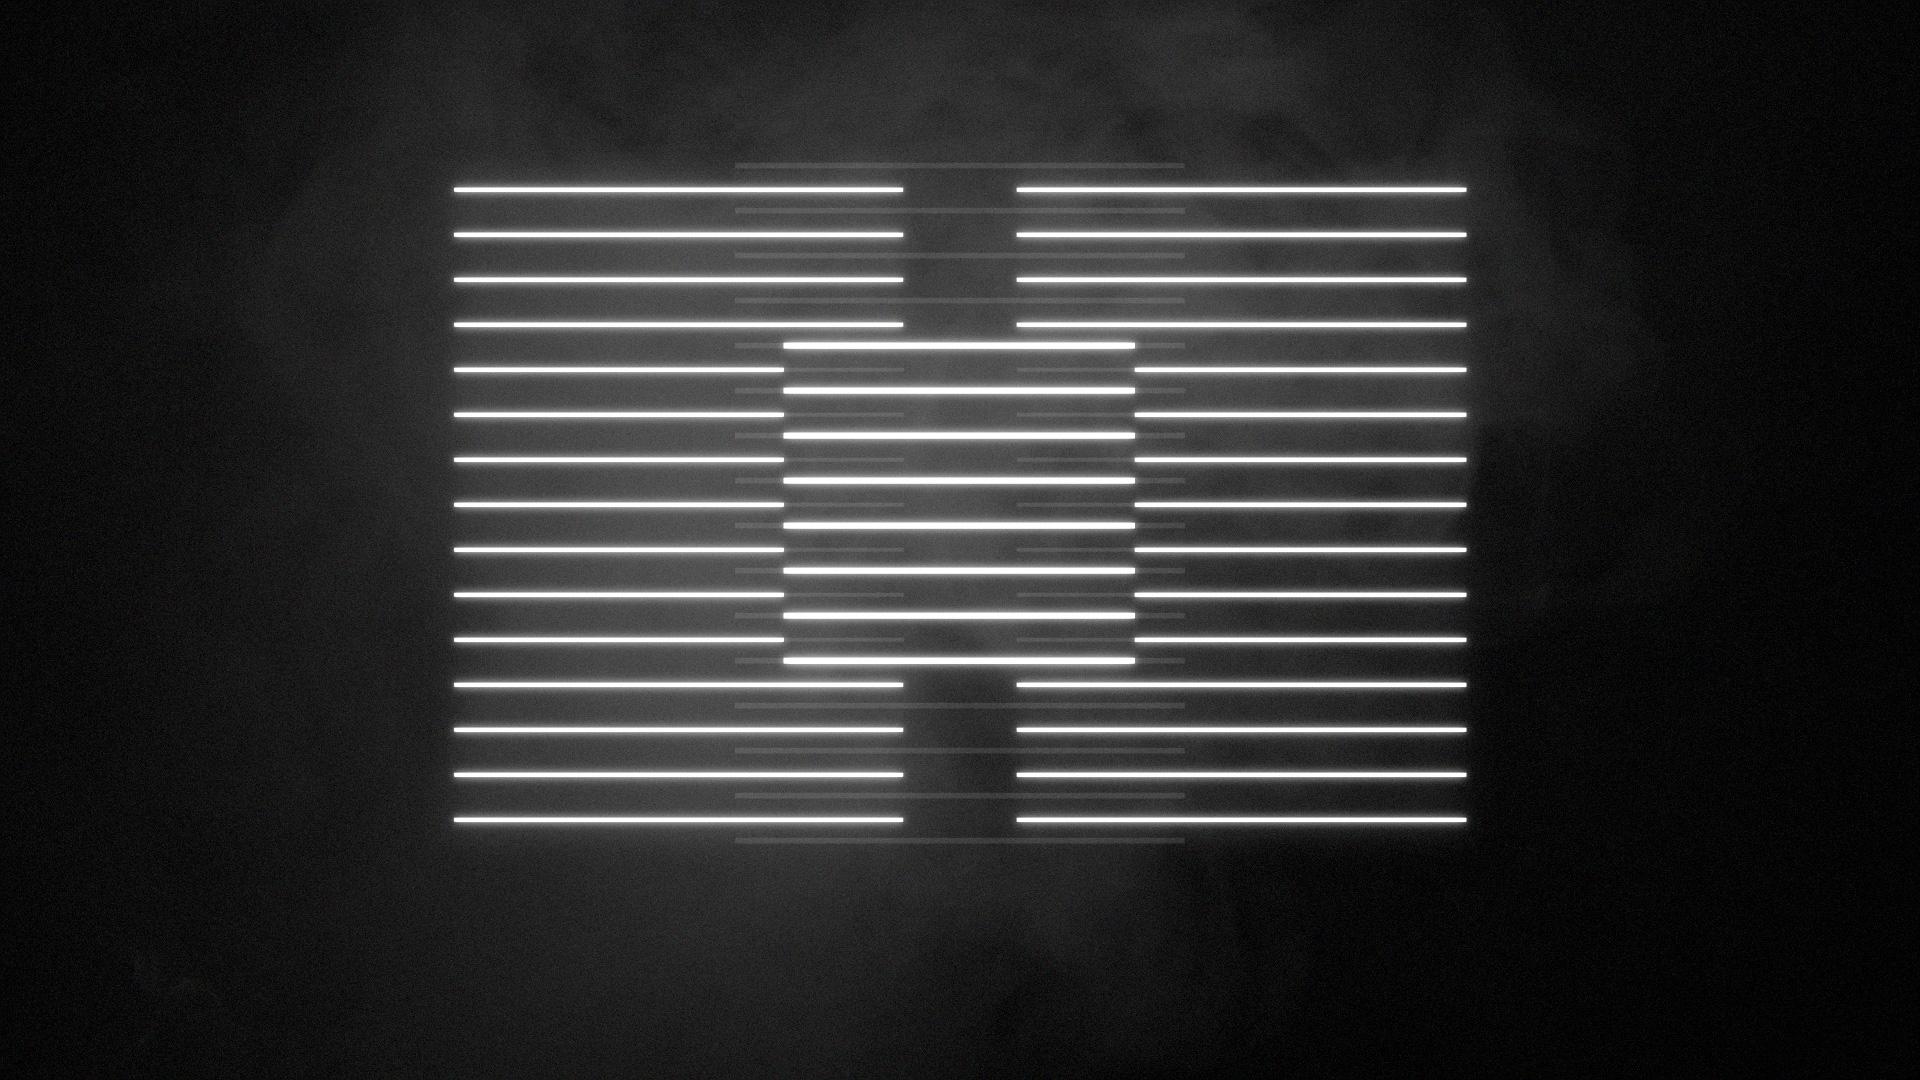 Bezold_Tigrelab+Protopixel-MUTEK_WorkingProgress_3.jpg